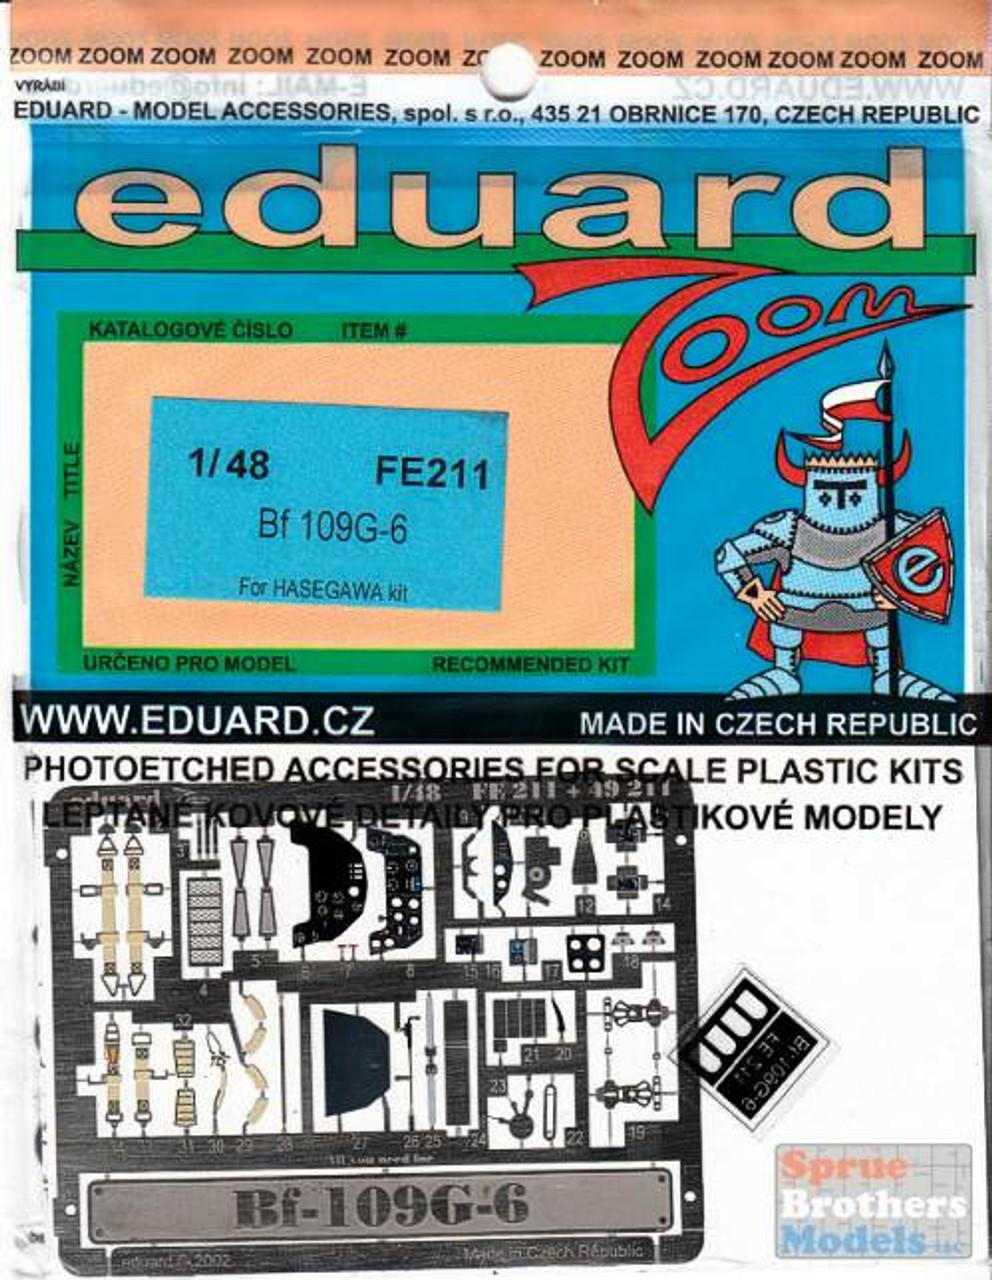 EDUFE211 1:48 Eduard Color Zoom PE - Bf 109G-6 (HAS kit)